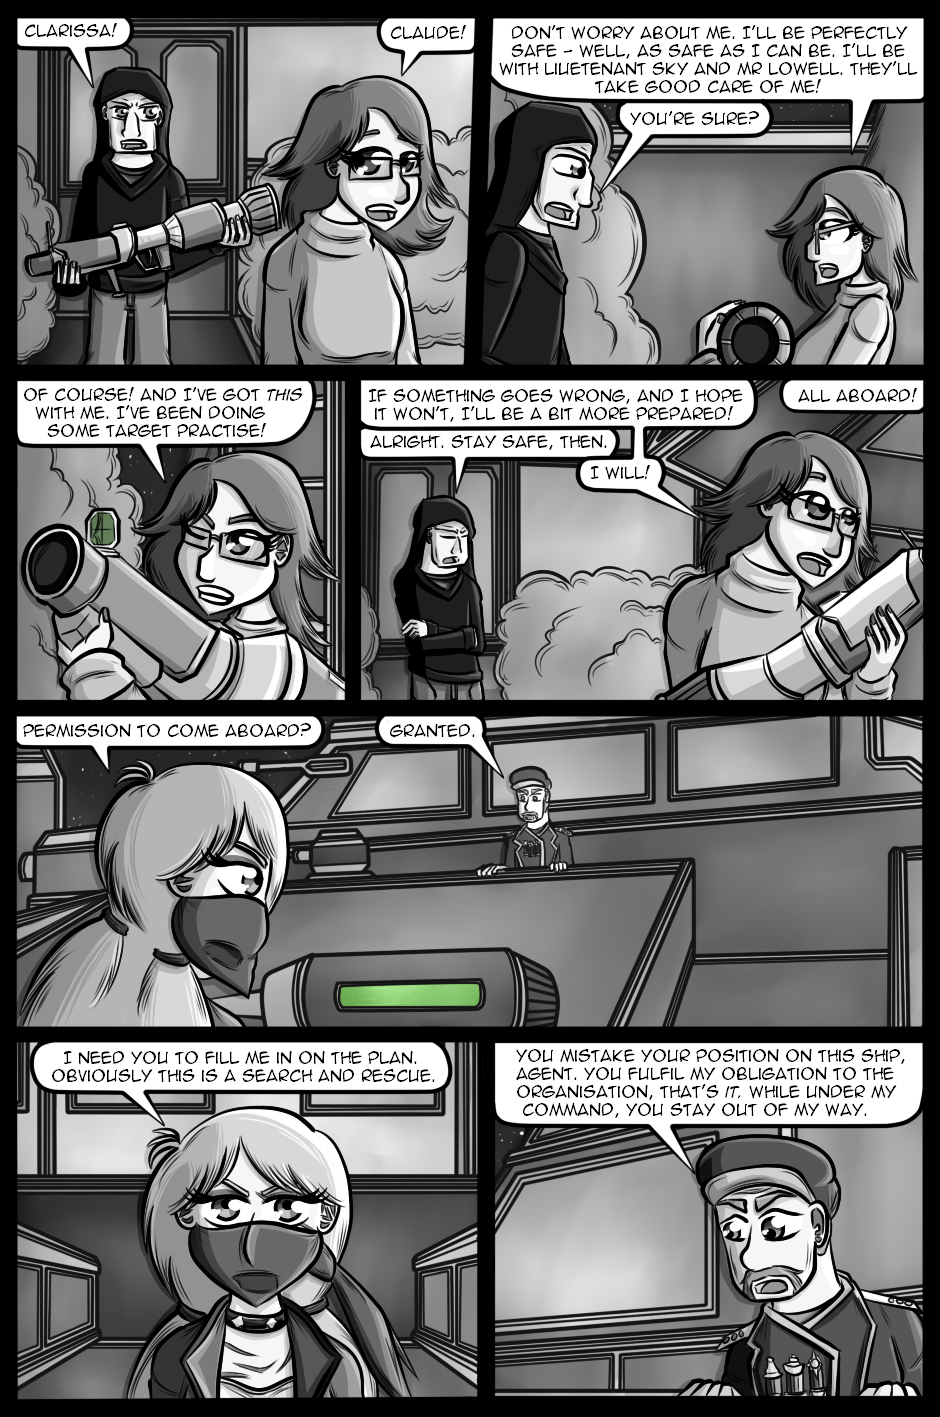 Fire Suppression, Part 19